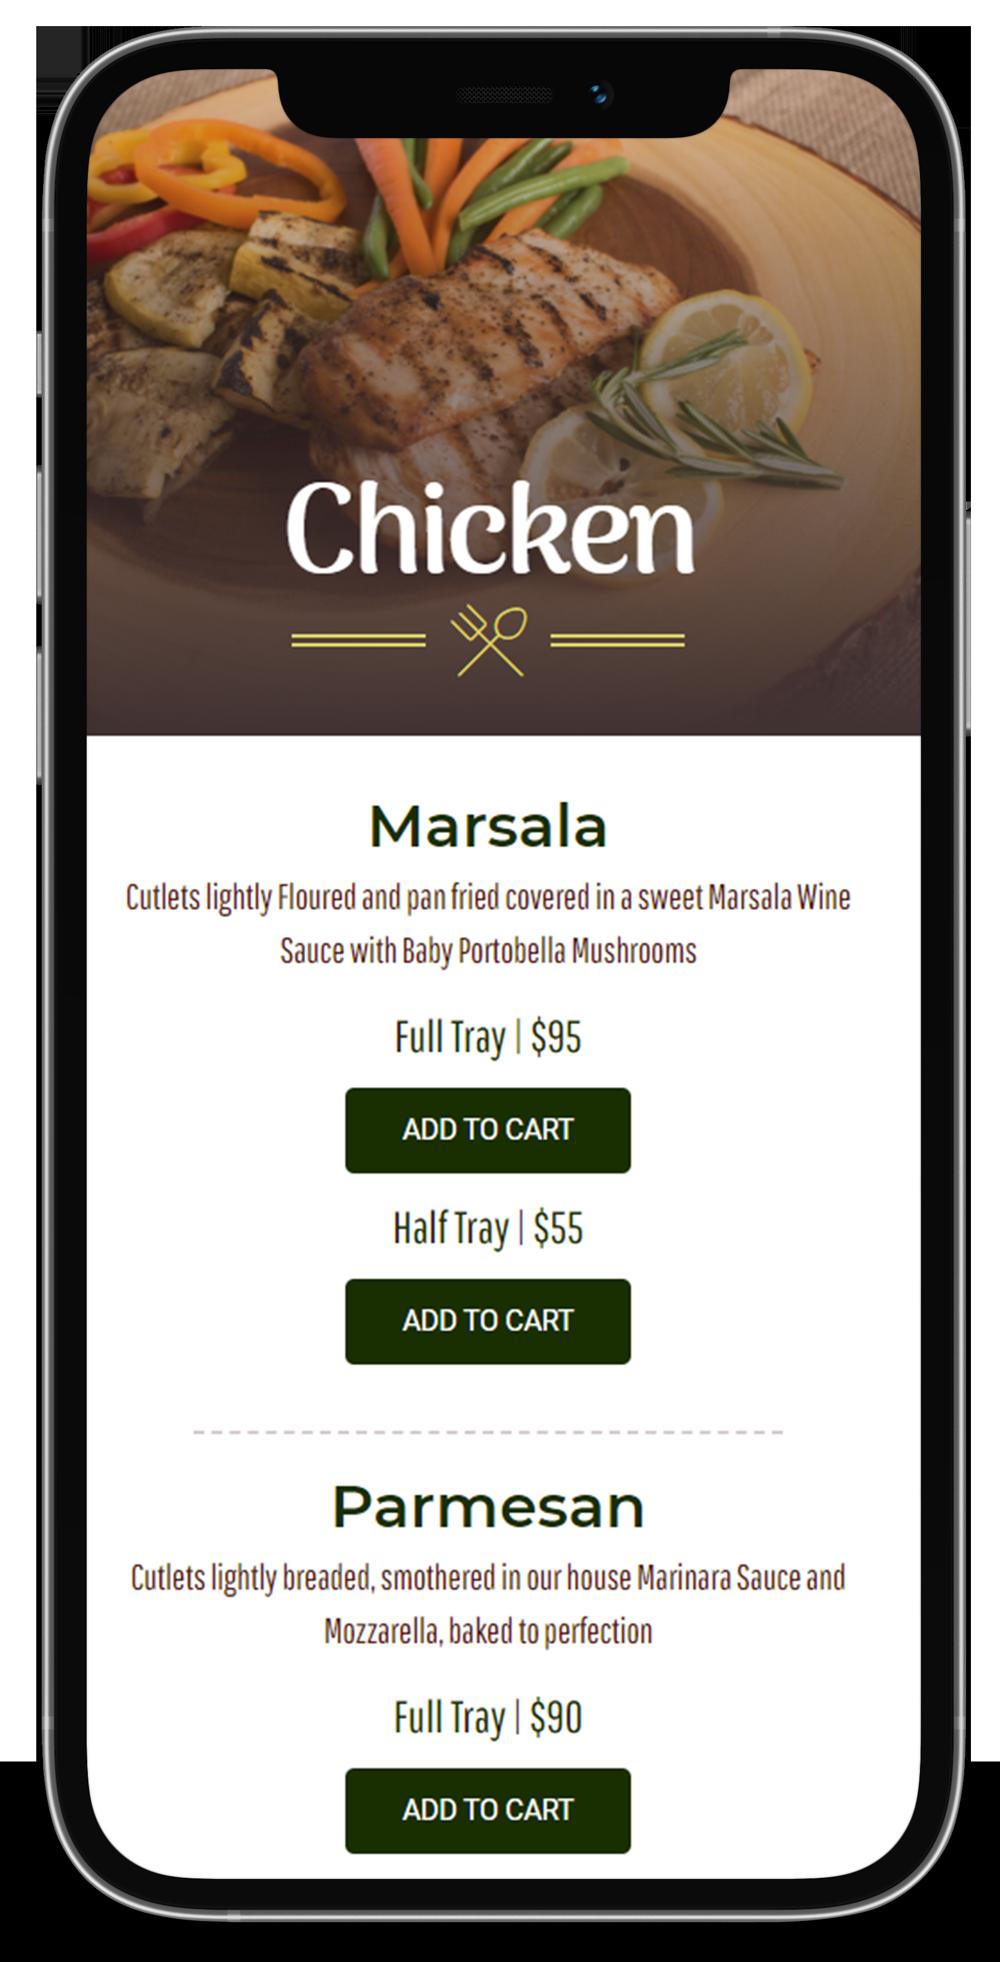 online ordering website, cooking carusos catering, restaurant menu